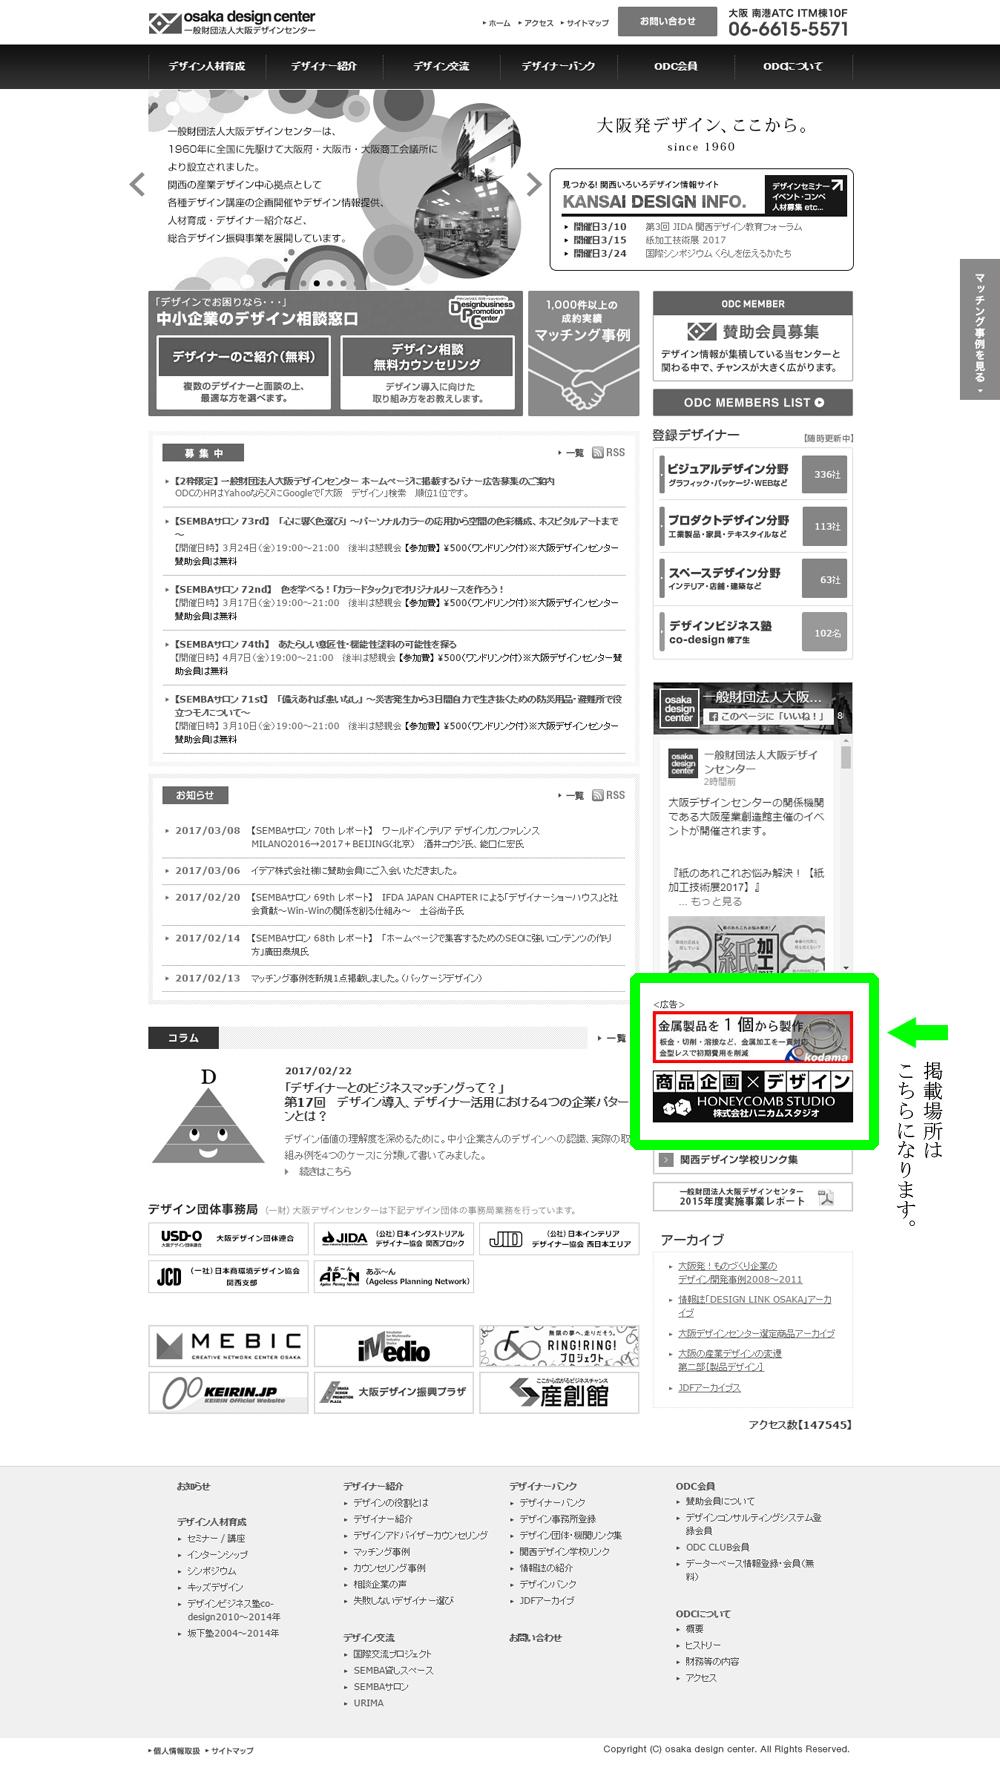 http://www.osakadc.jp/banarplace.jpg